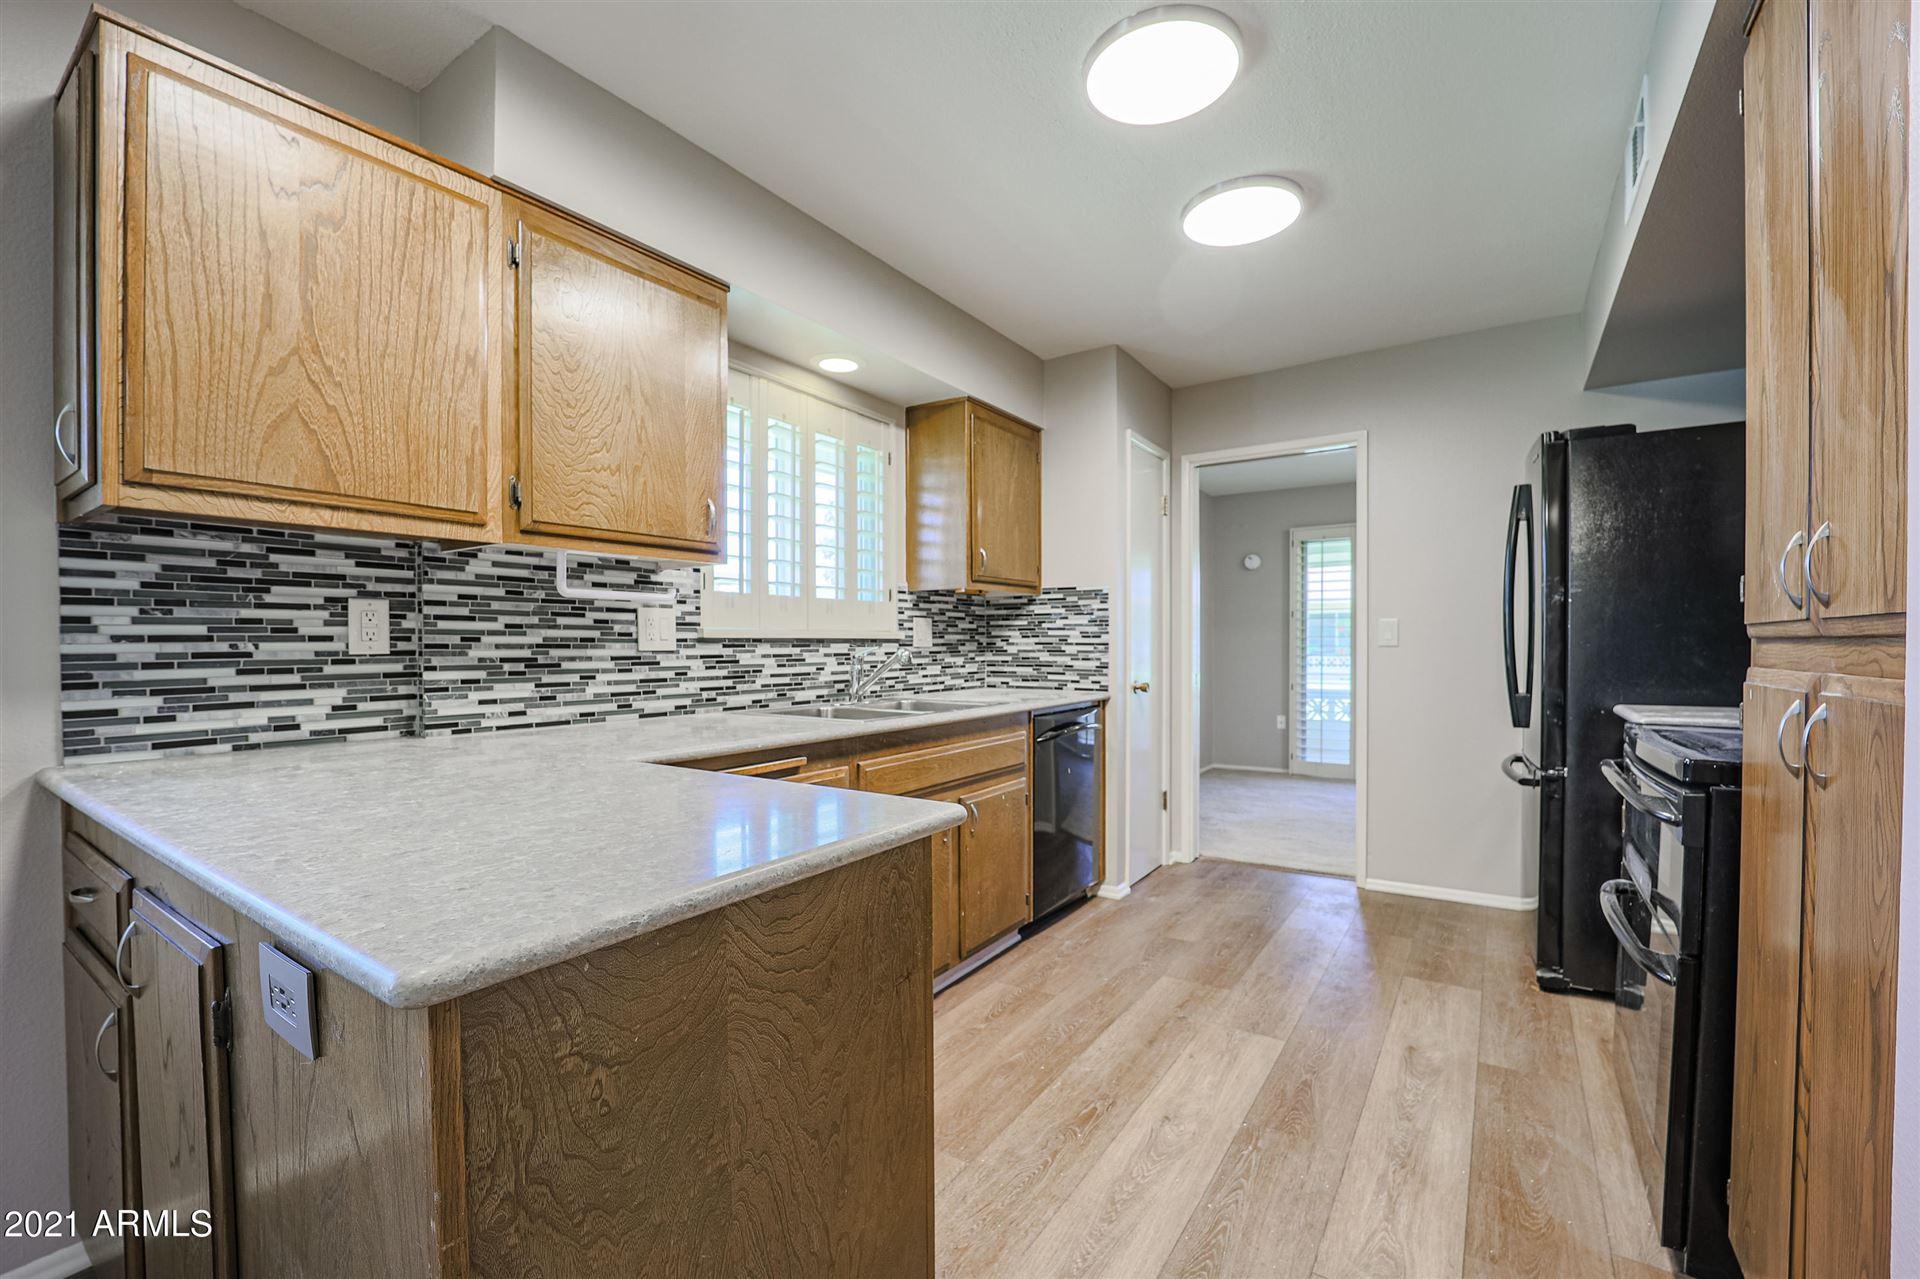 Photo of 10348 W KINGSWOOD Circle, Sun City, AZ 85351 (MLS # 6250084)